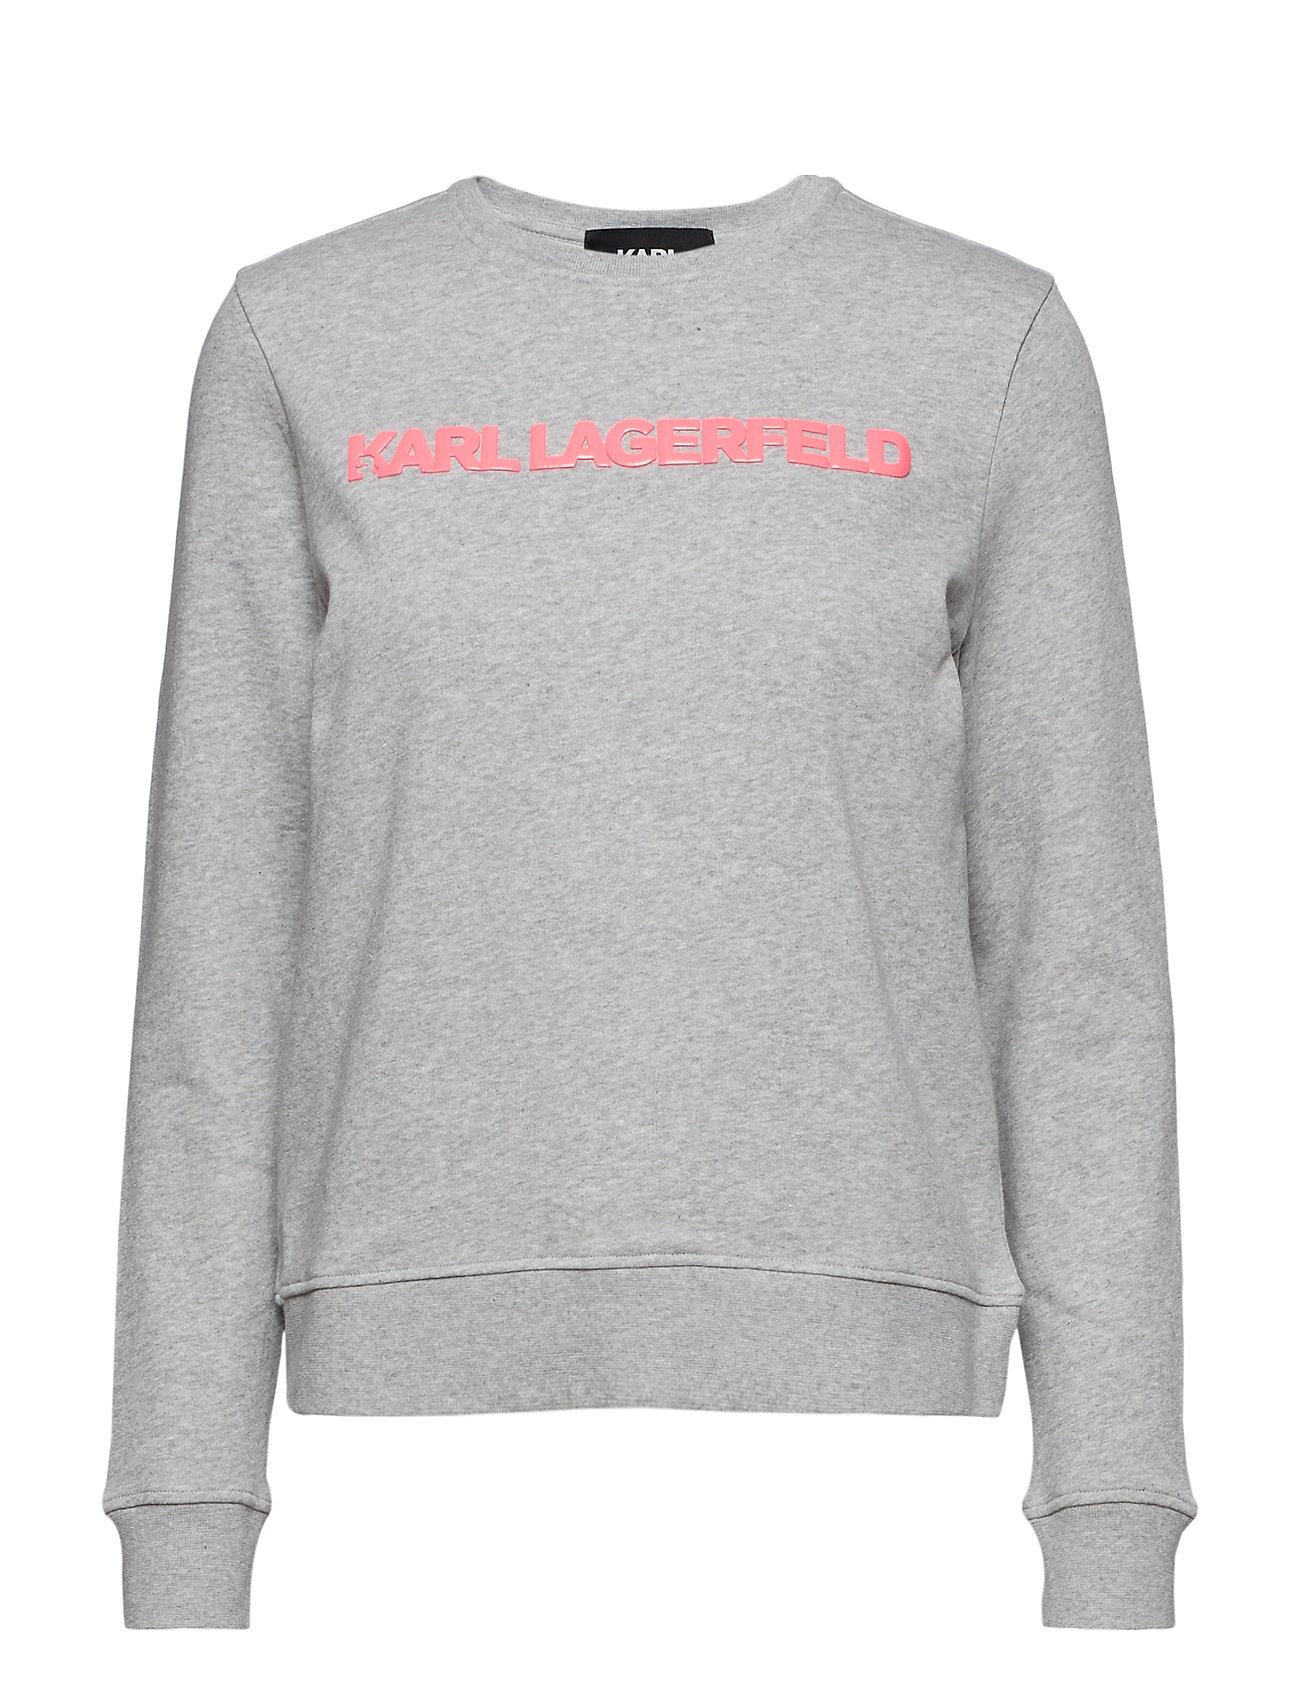 Karl Lagerfeld Neon Lights Logo Sweatshirt - GREY